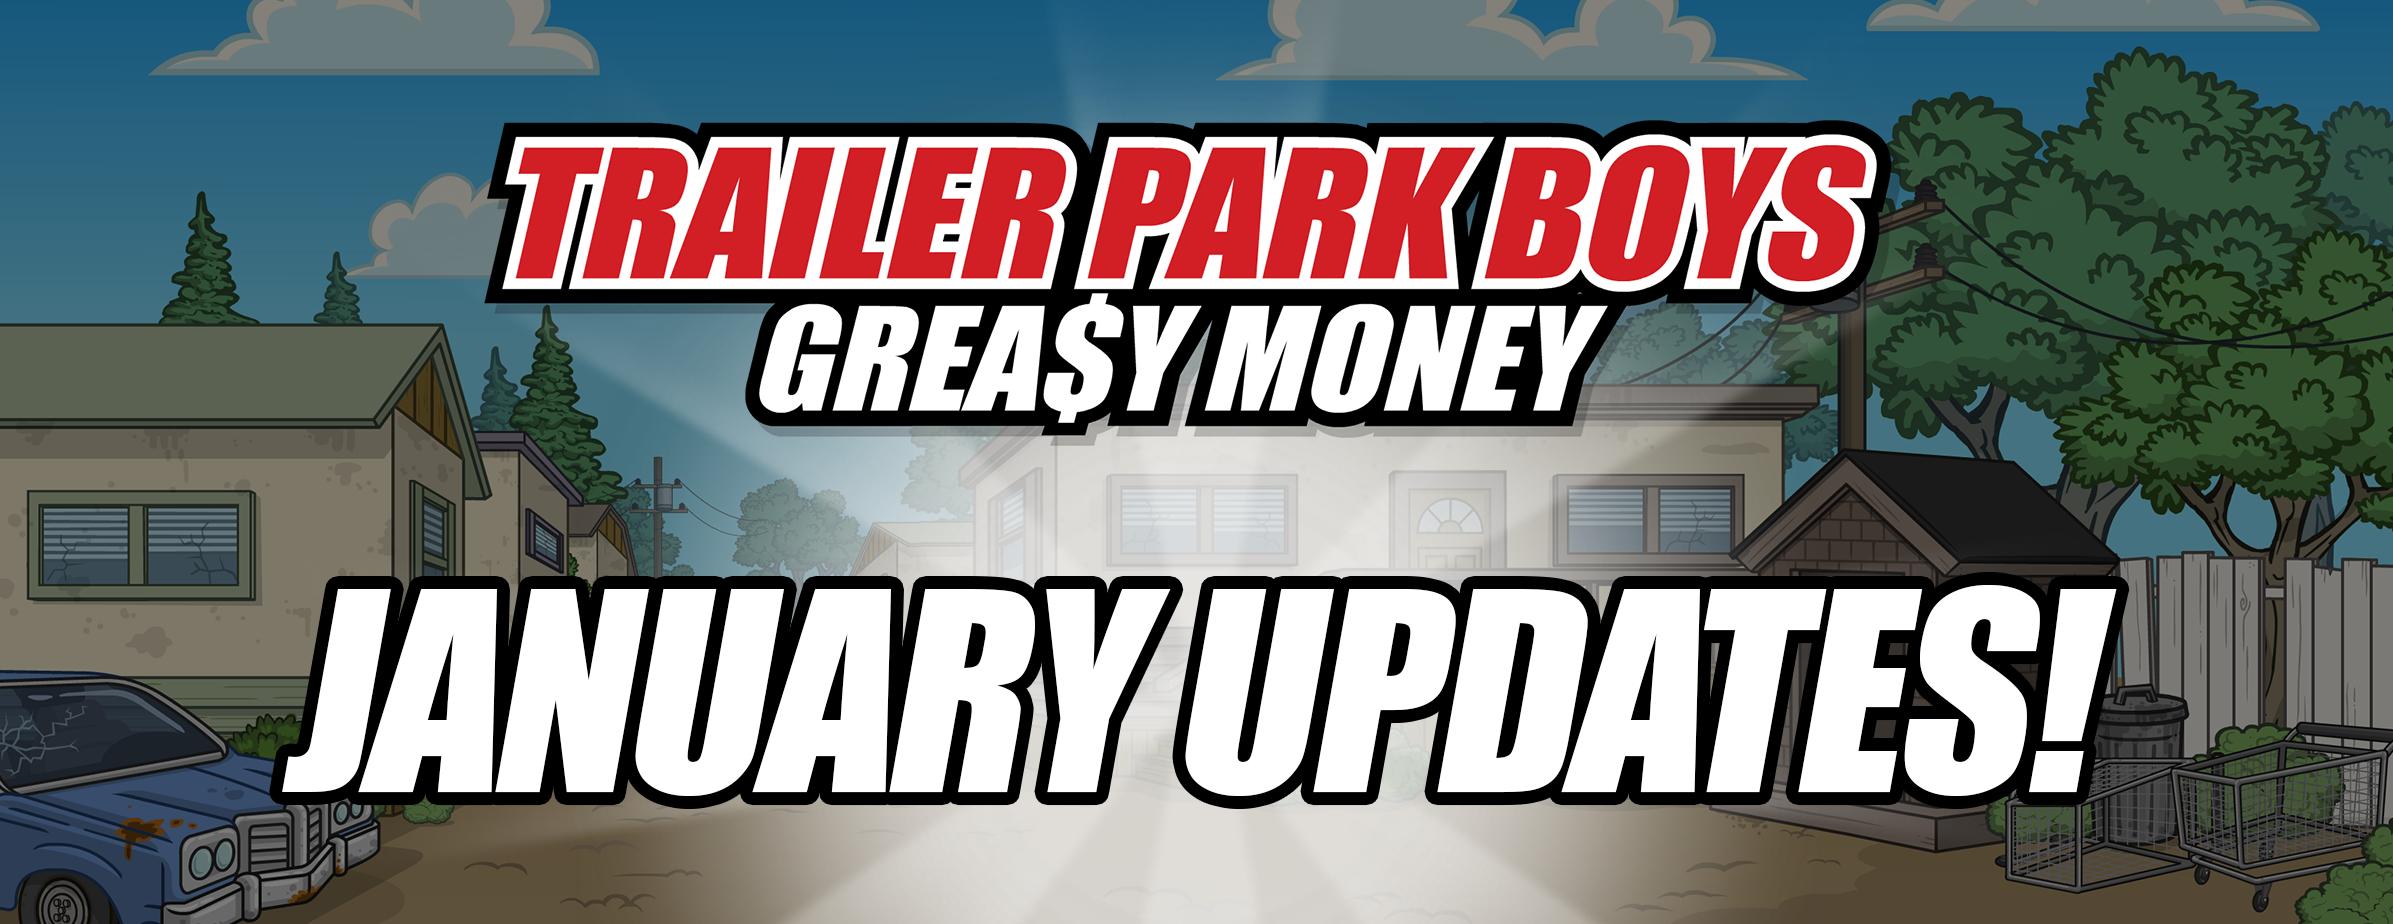 Trailer Park Boys: Greasy January Events!